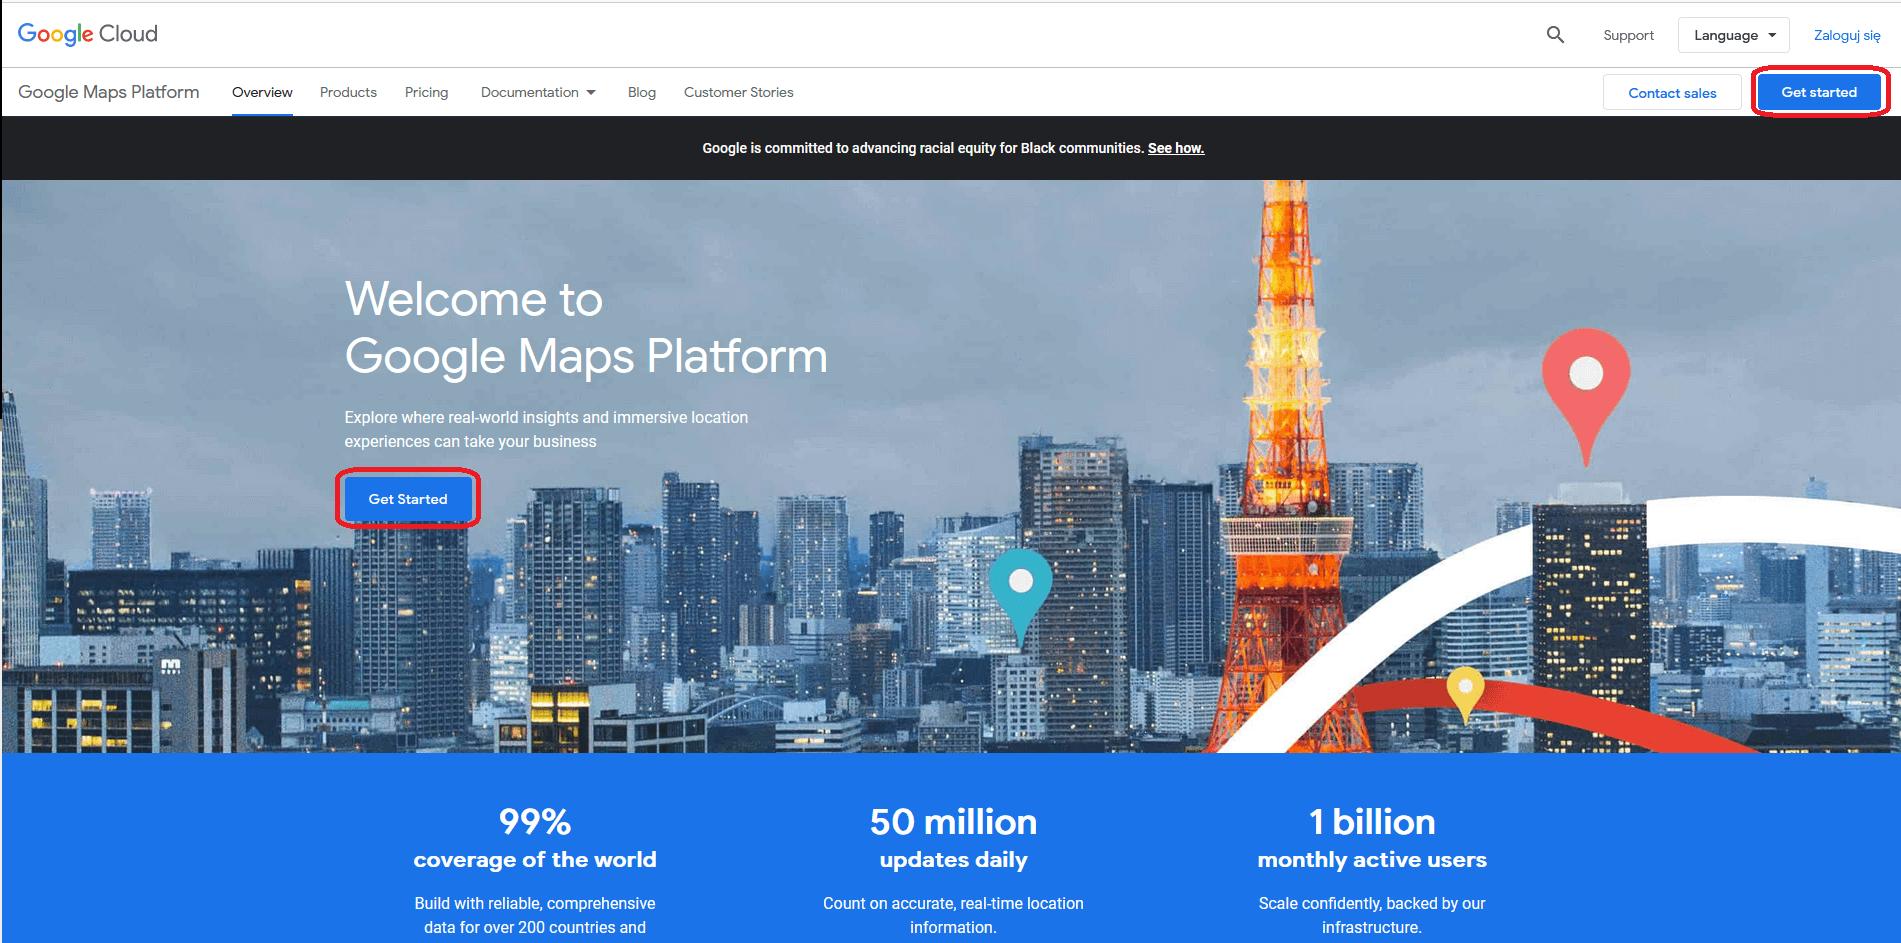 logowanie Google Cloud Platform